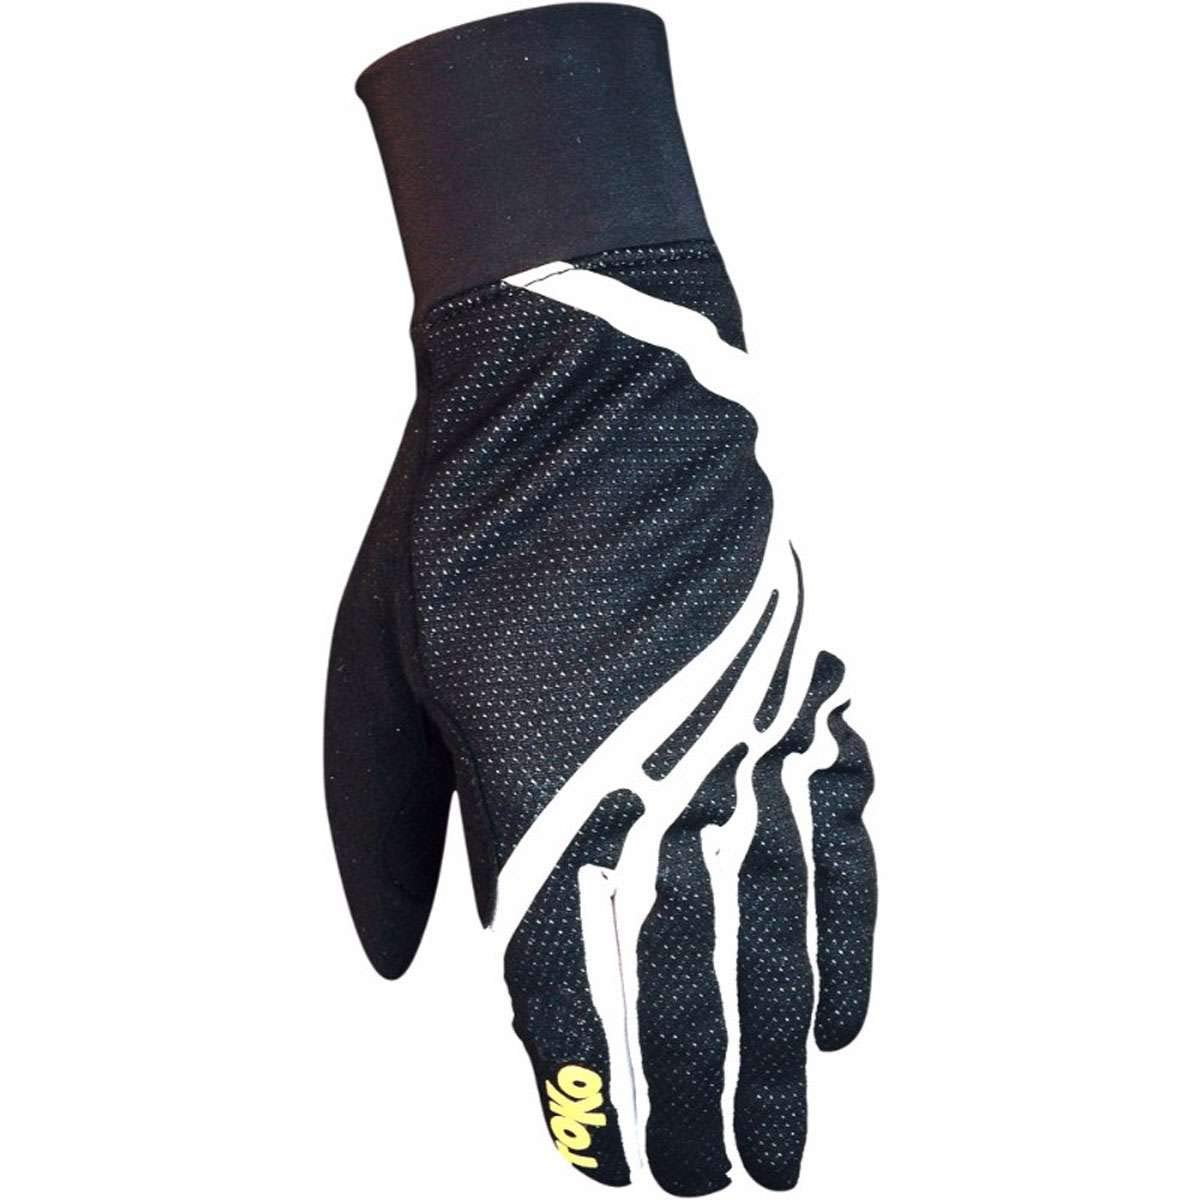 Toko Profi Gloves